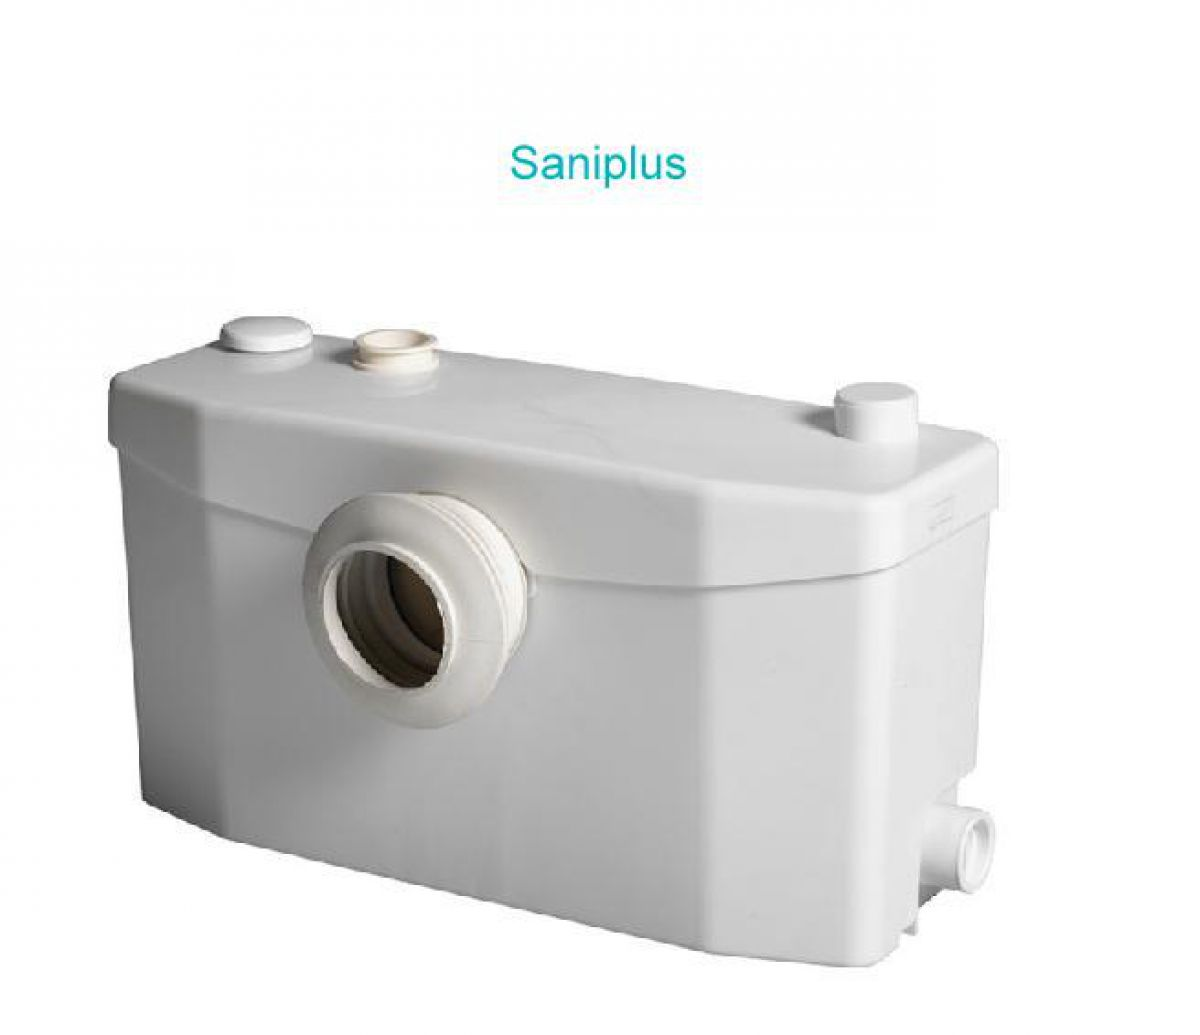 Saniplus Saniflo Macerator Uk Bathrooms